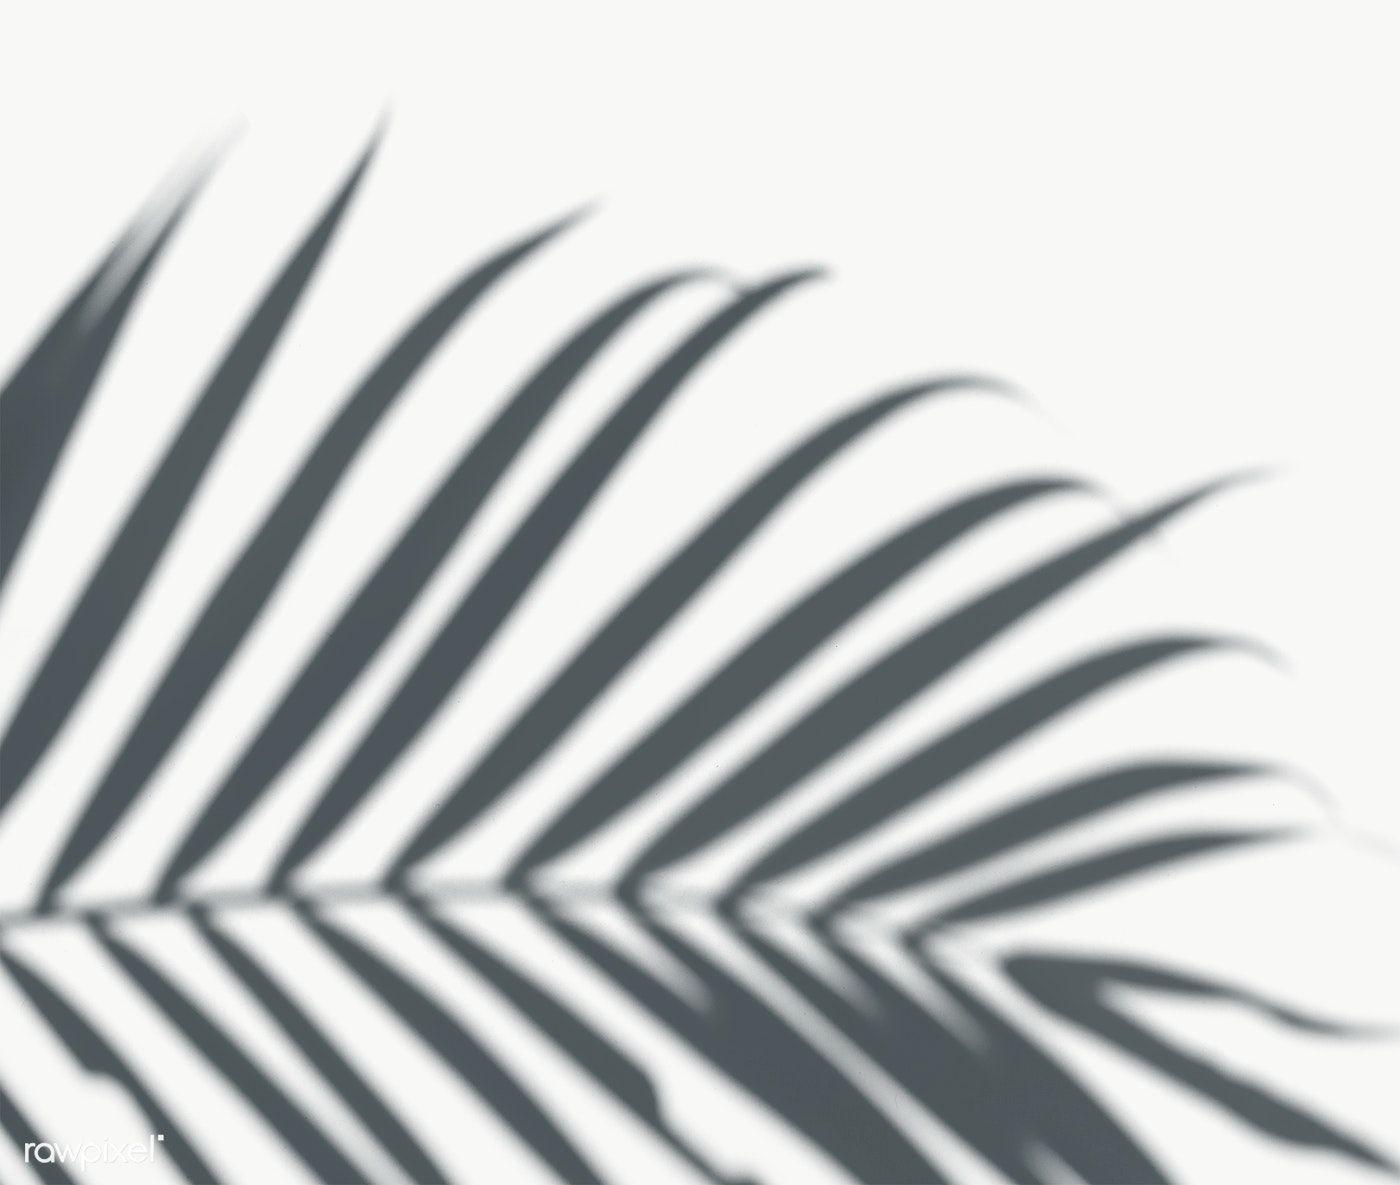 Shadow Of Palm Leaves On A White Wall Free Image By Rawpixel Com Ideias De Fotos Sombras De Janelas Fotos